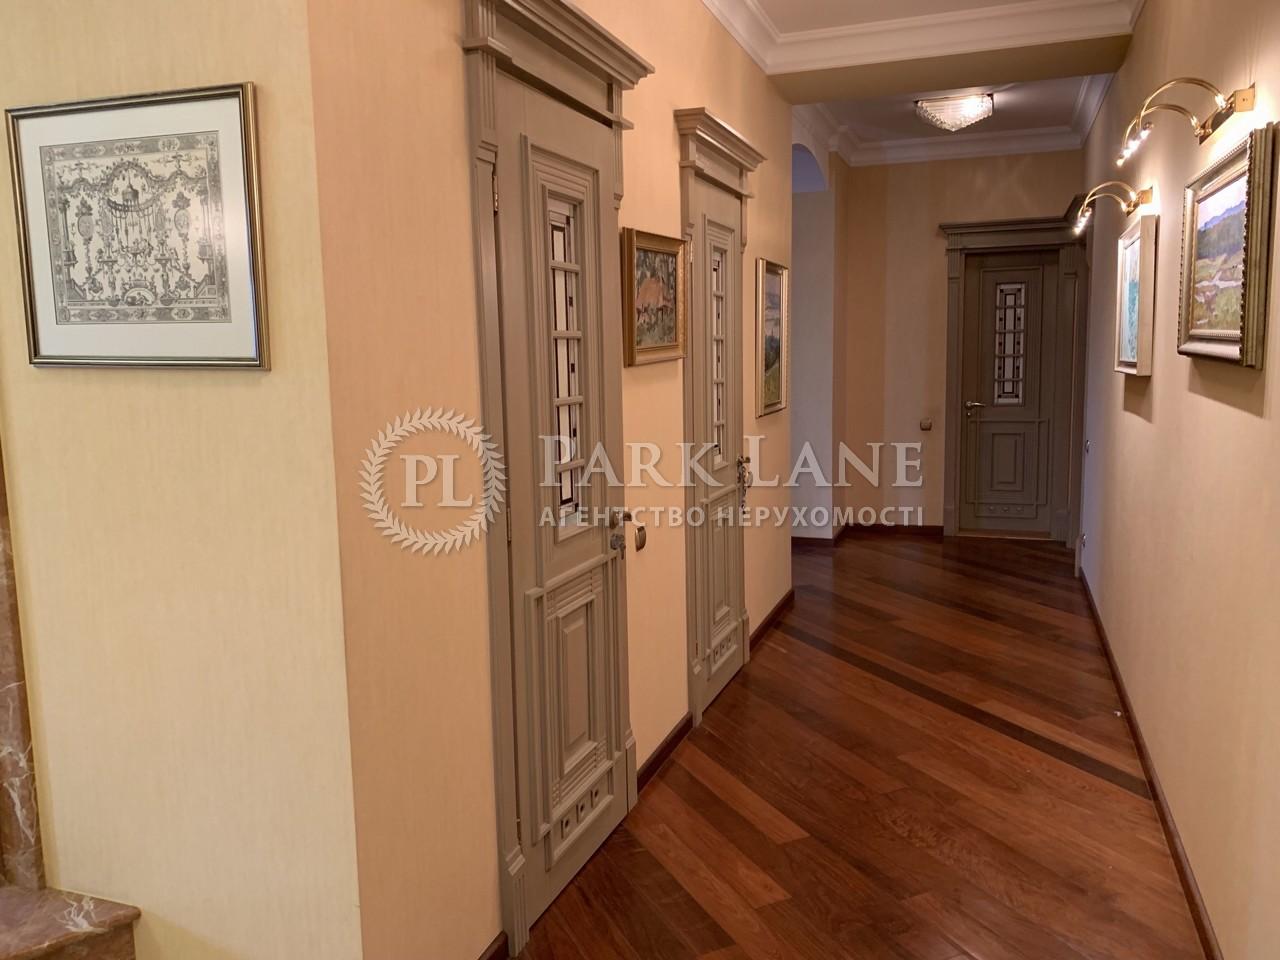 Квартира ул. Пирогова, 6а, Киев, J-28125 - Фото 10